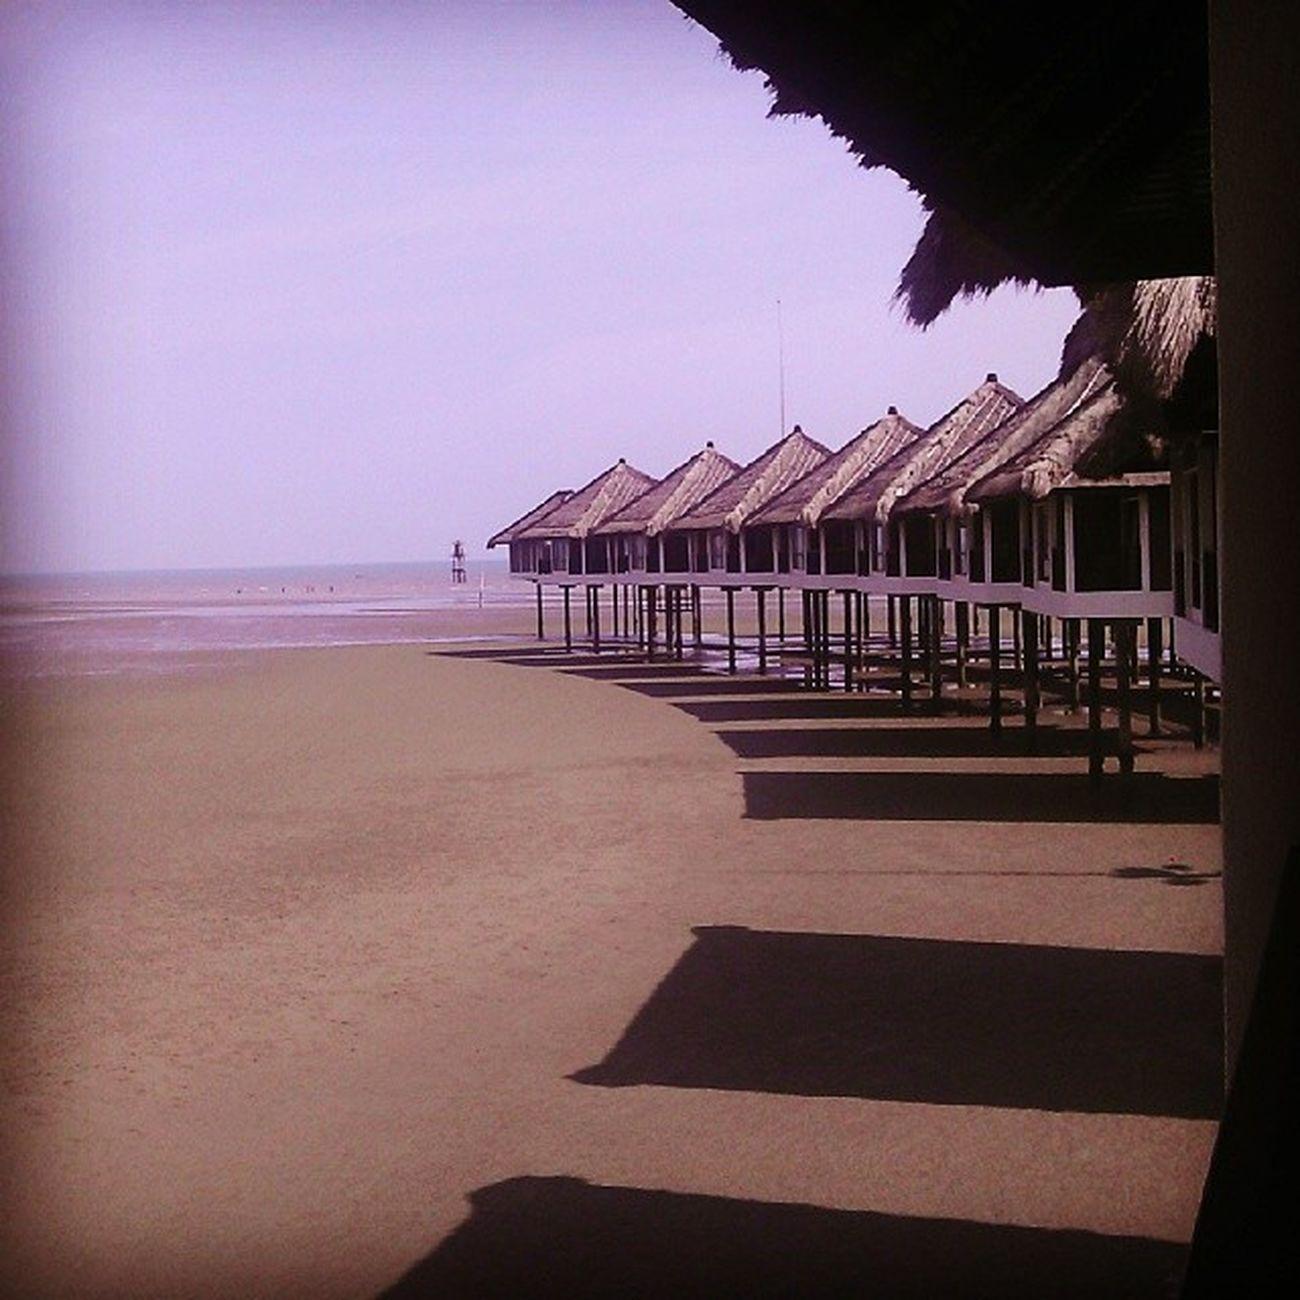 Di tepi pantai yang indah.... Sepanggoldcoast Sepang Beach Resort Pantai